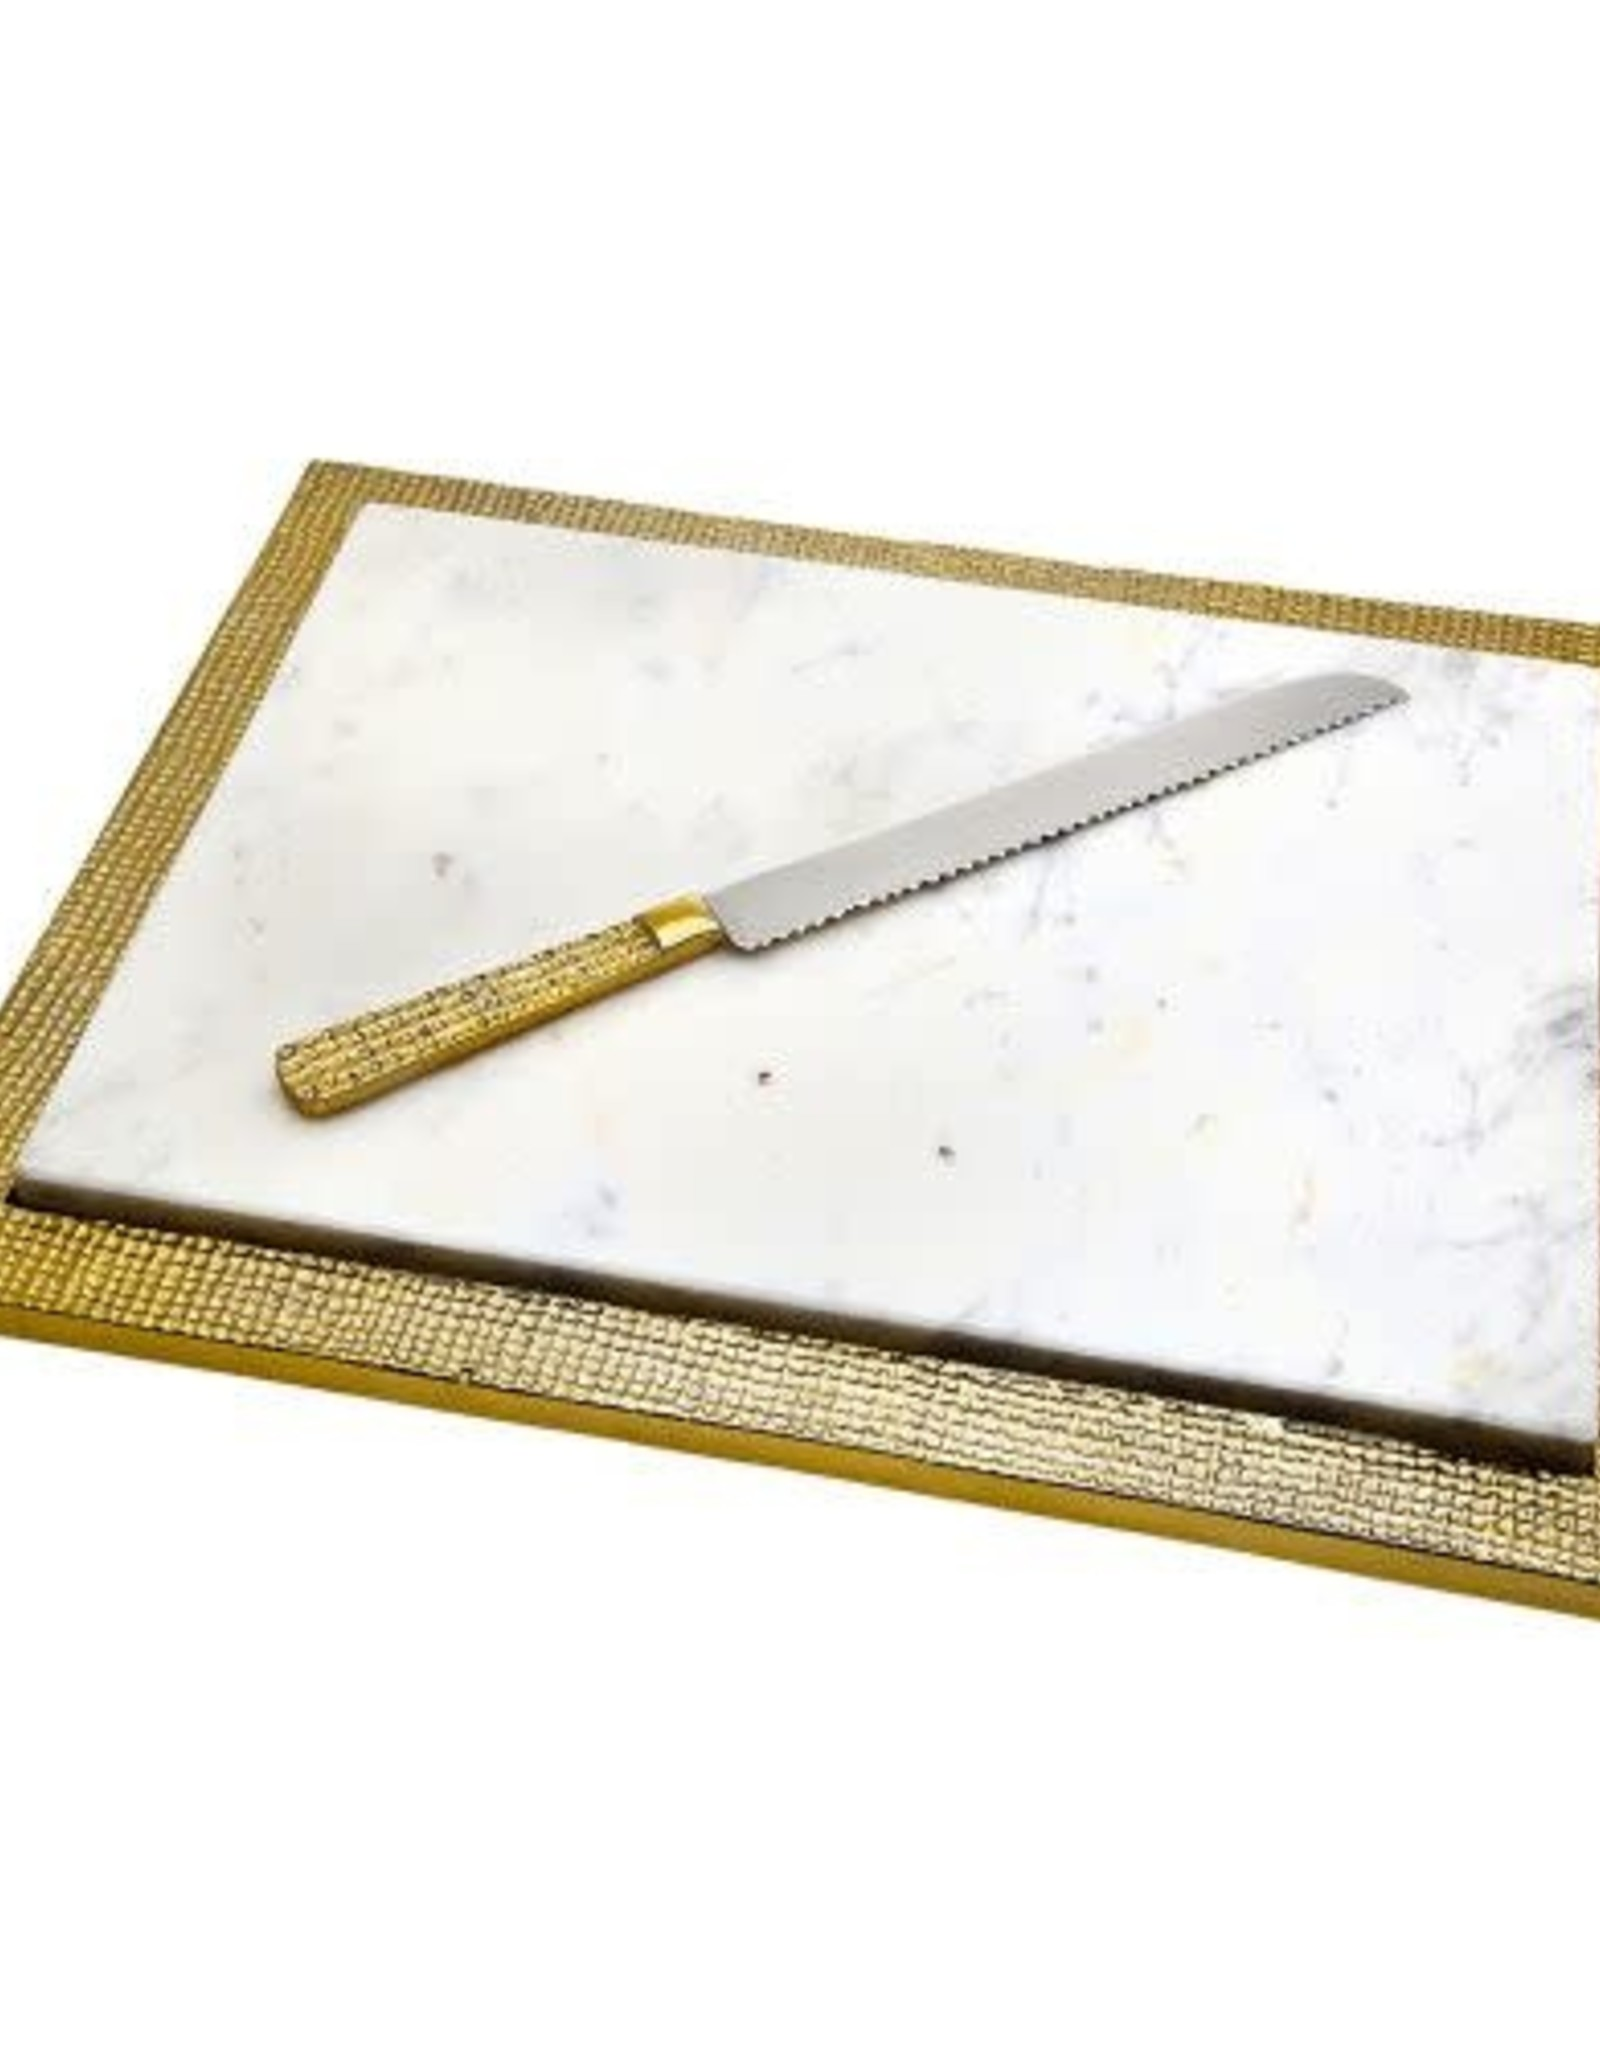 Challah board/knife marble